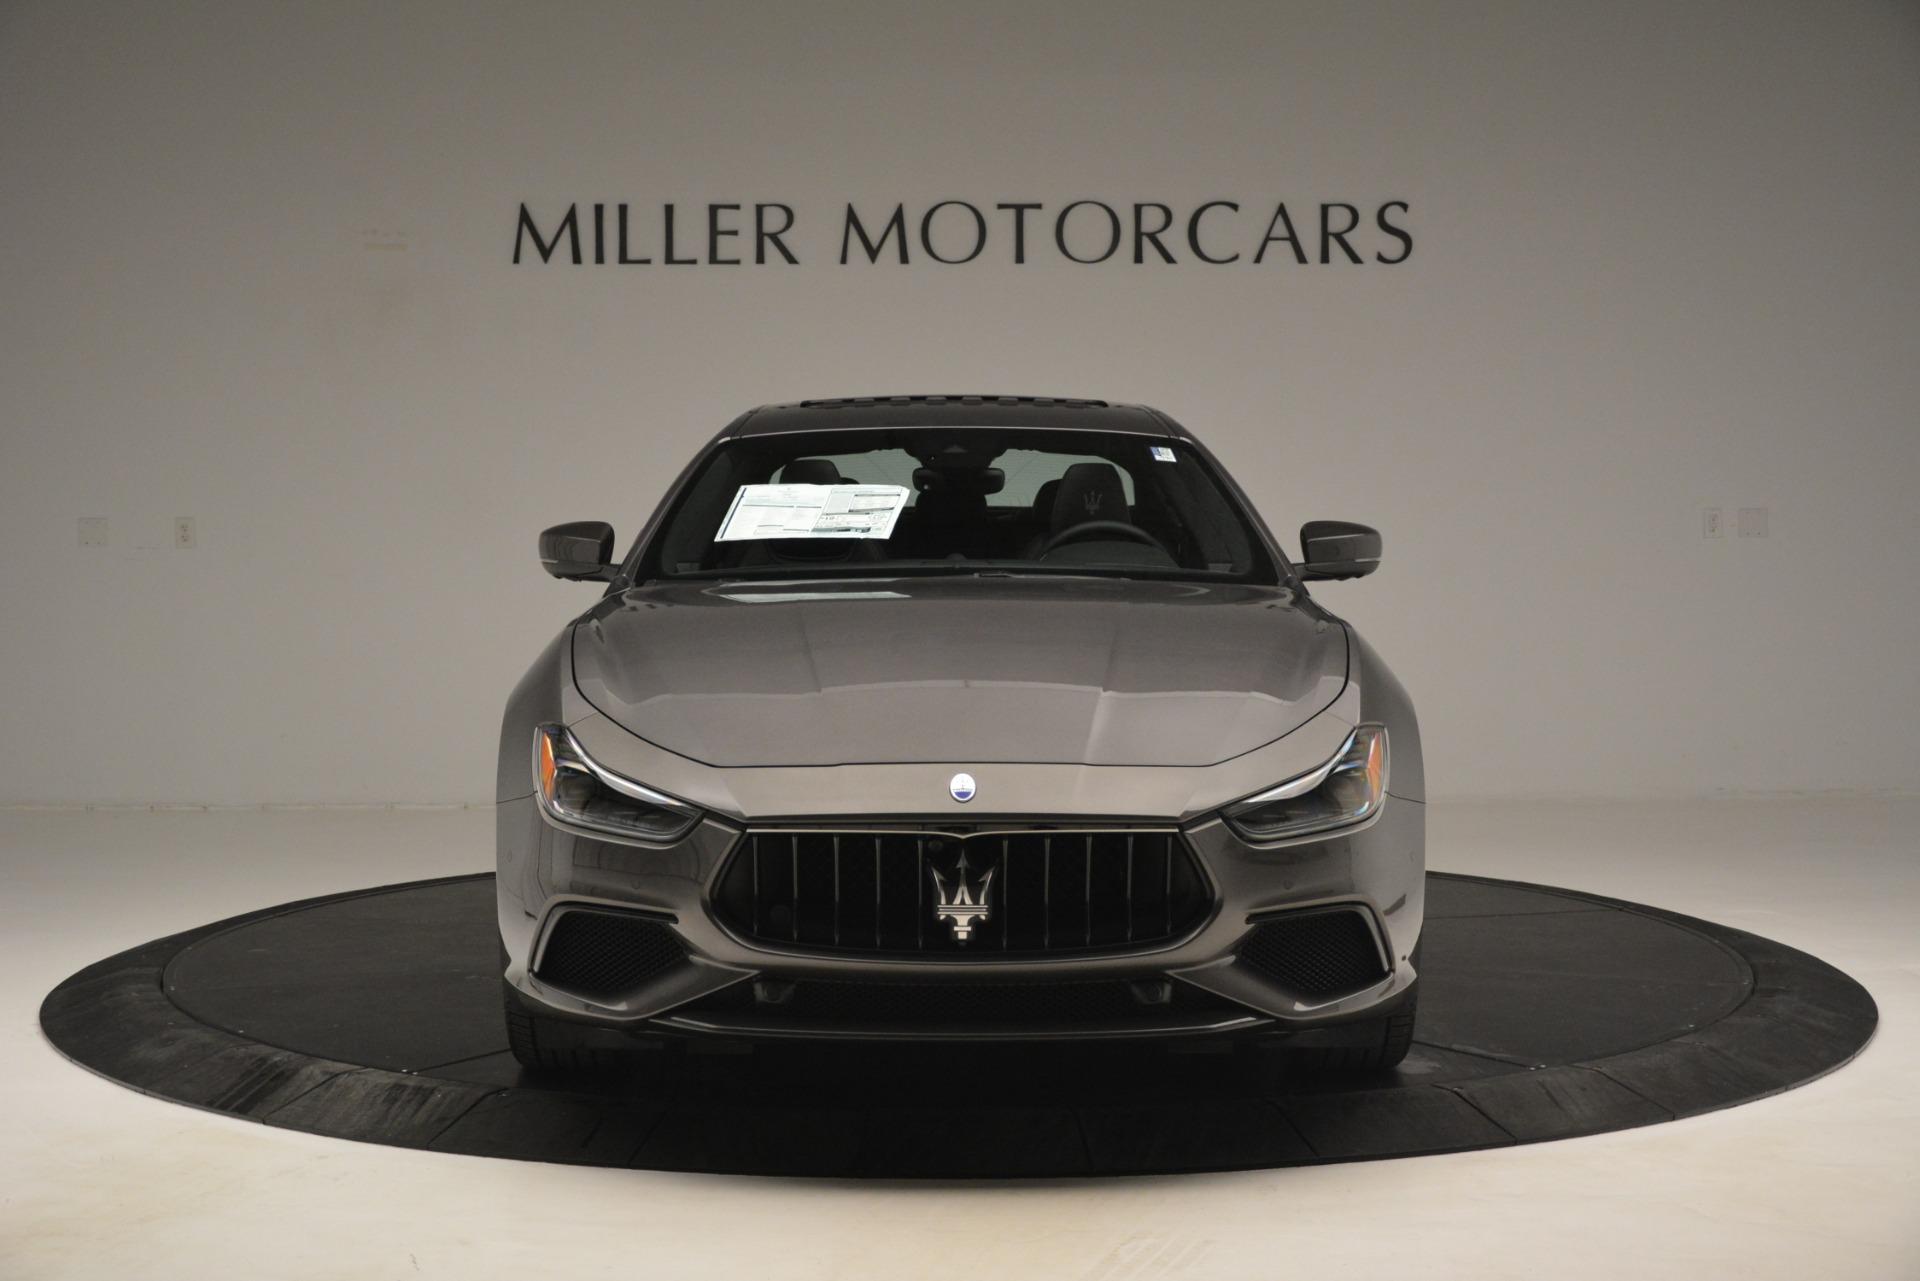 New 2019 Maserati Ghibli S Q4 GranSport For Sale In Greenwich, CT 2925_p13